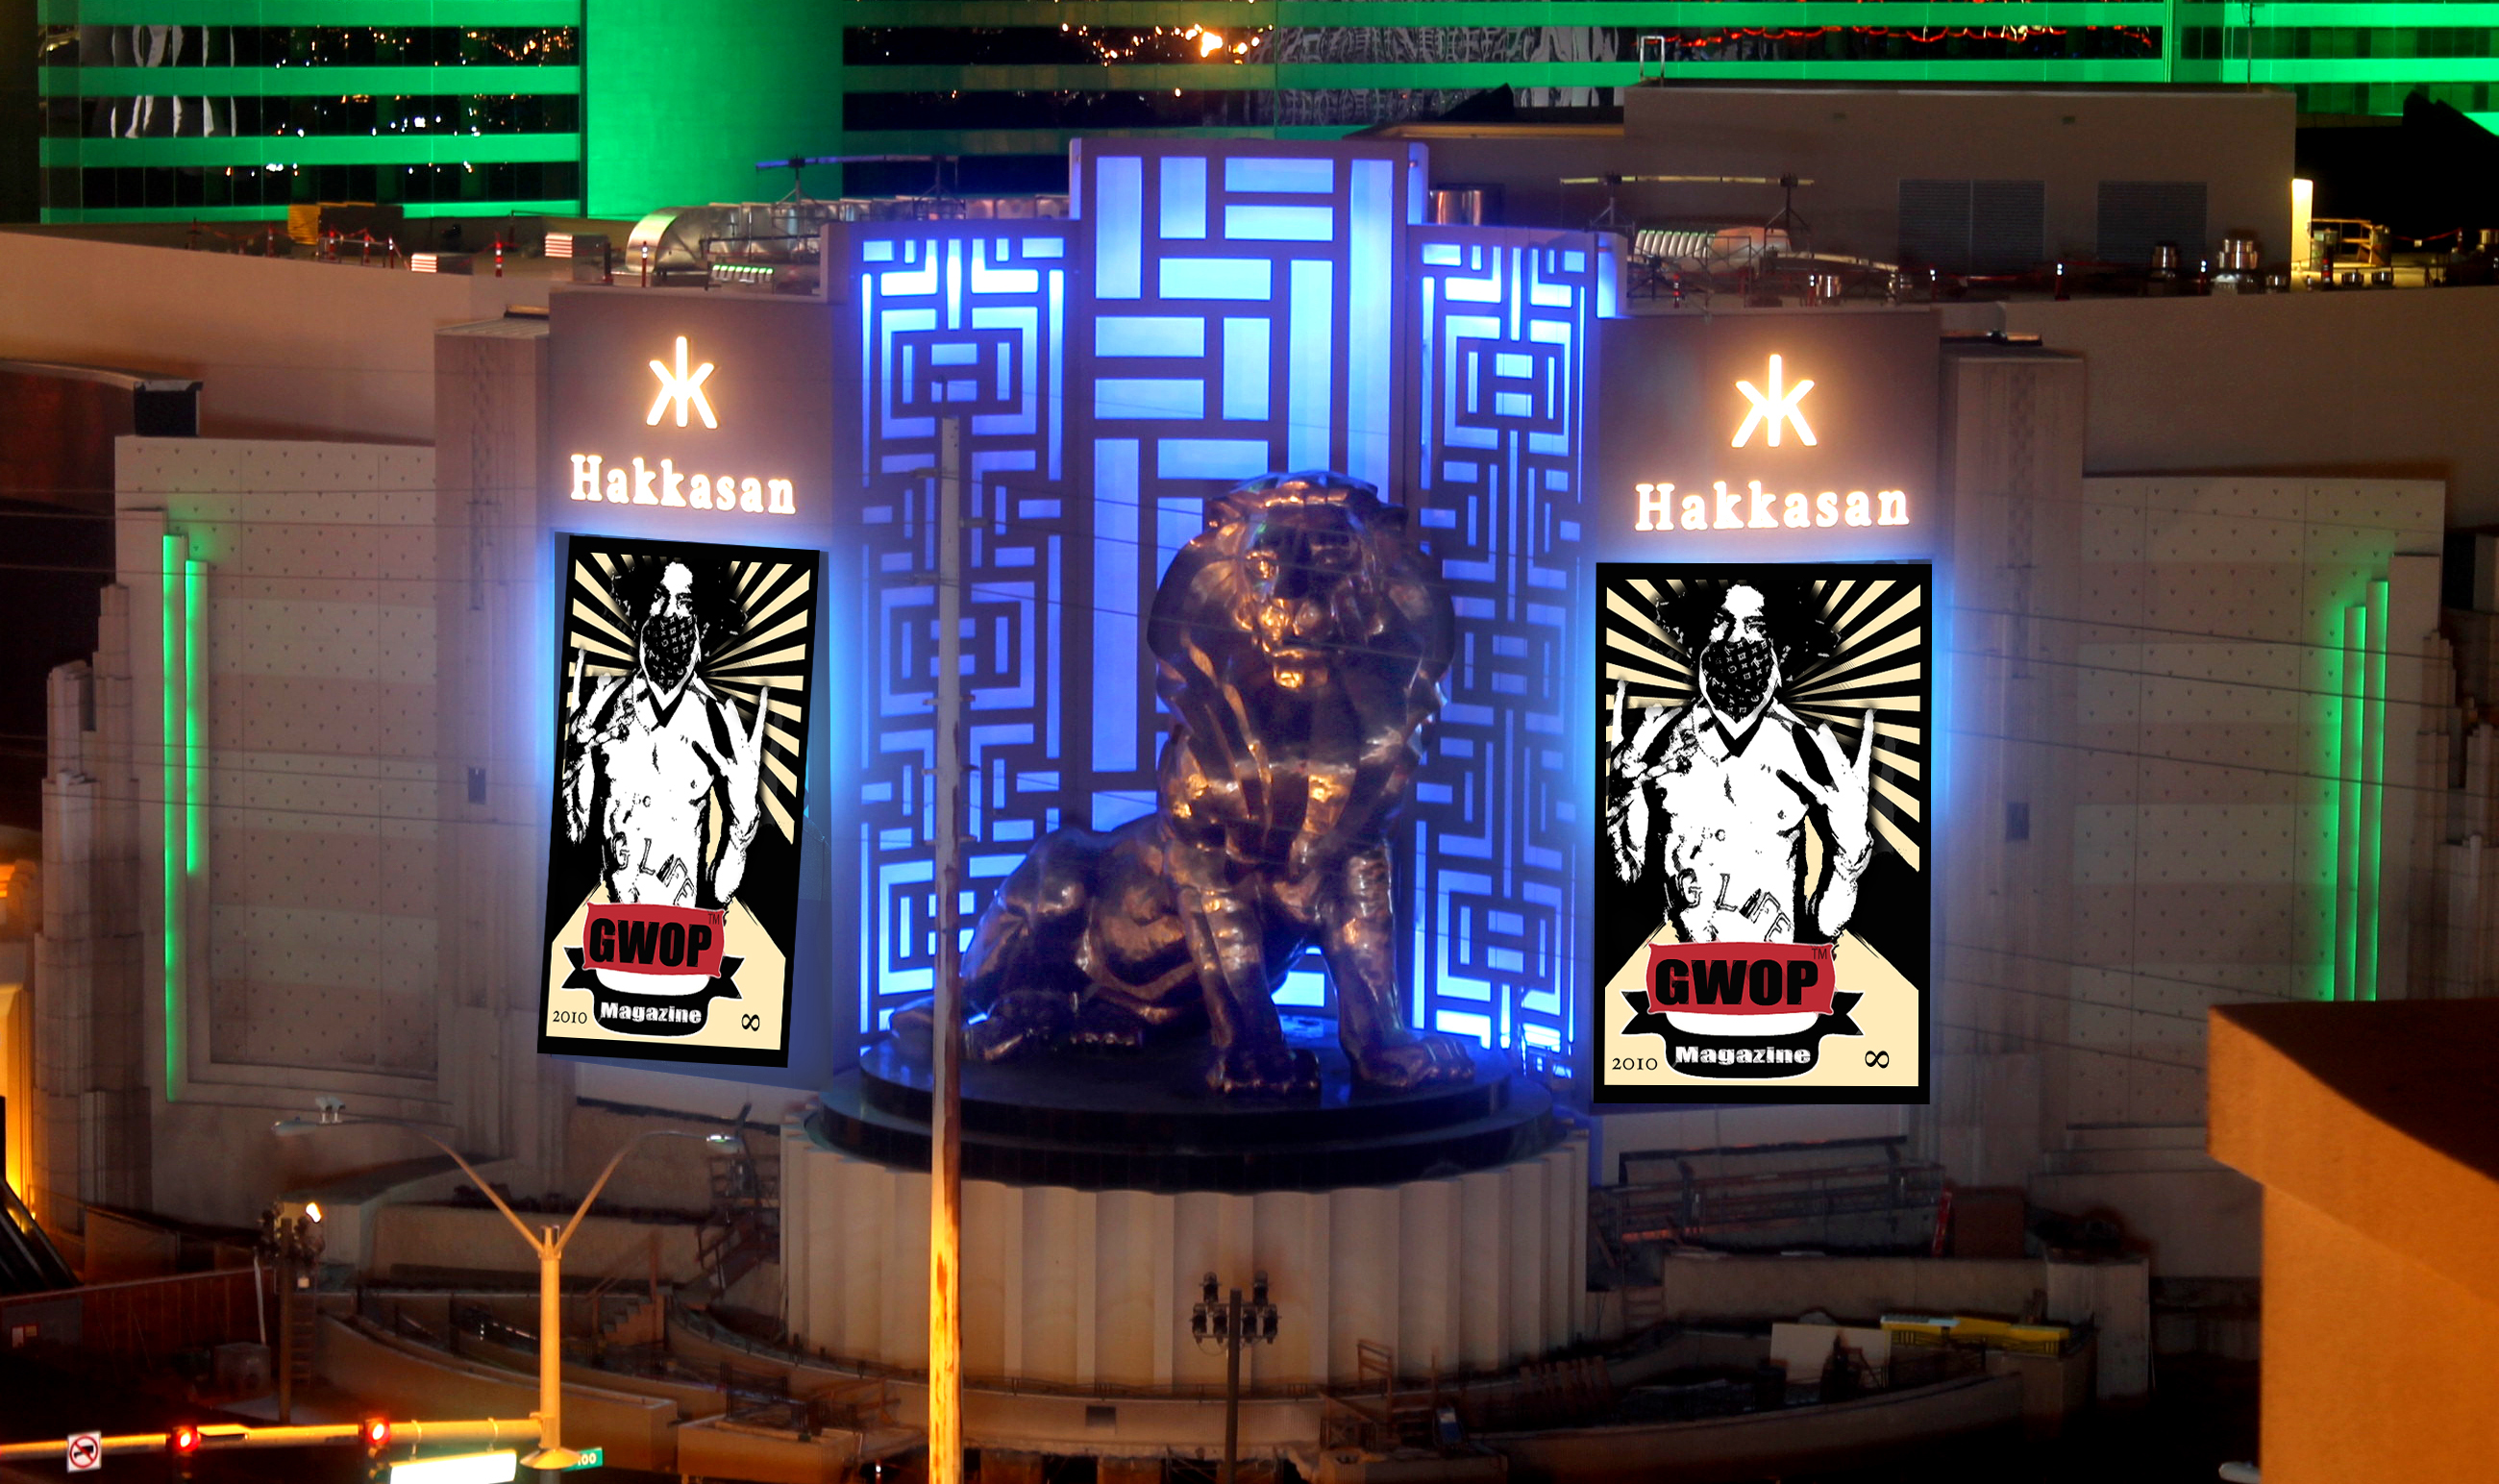 Hakkasan Las Vegas_Exterior of MGM Grand_1